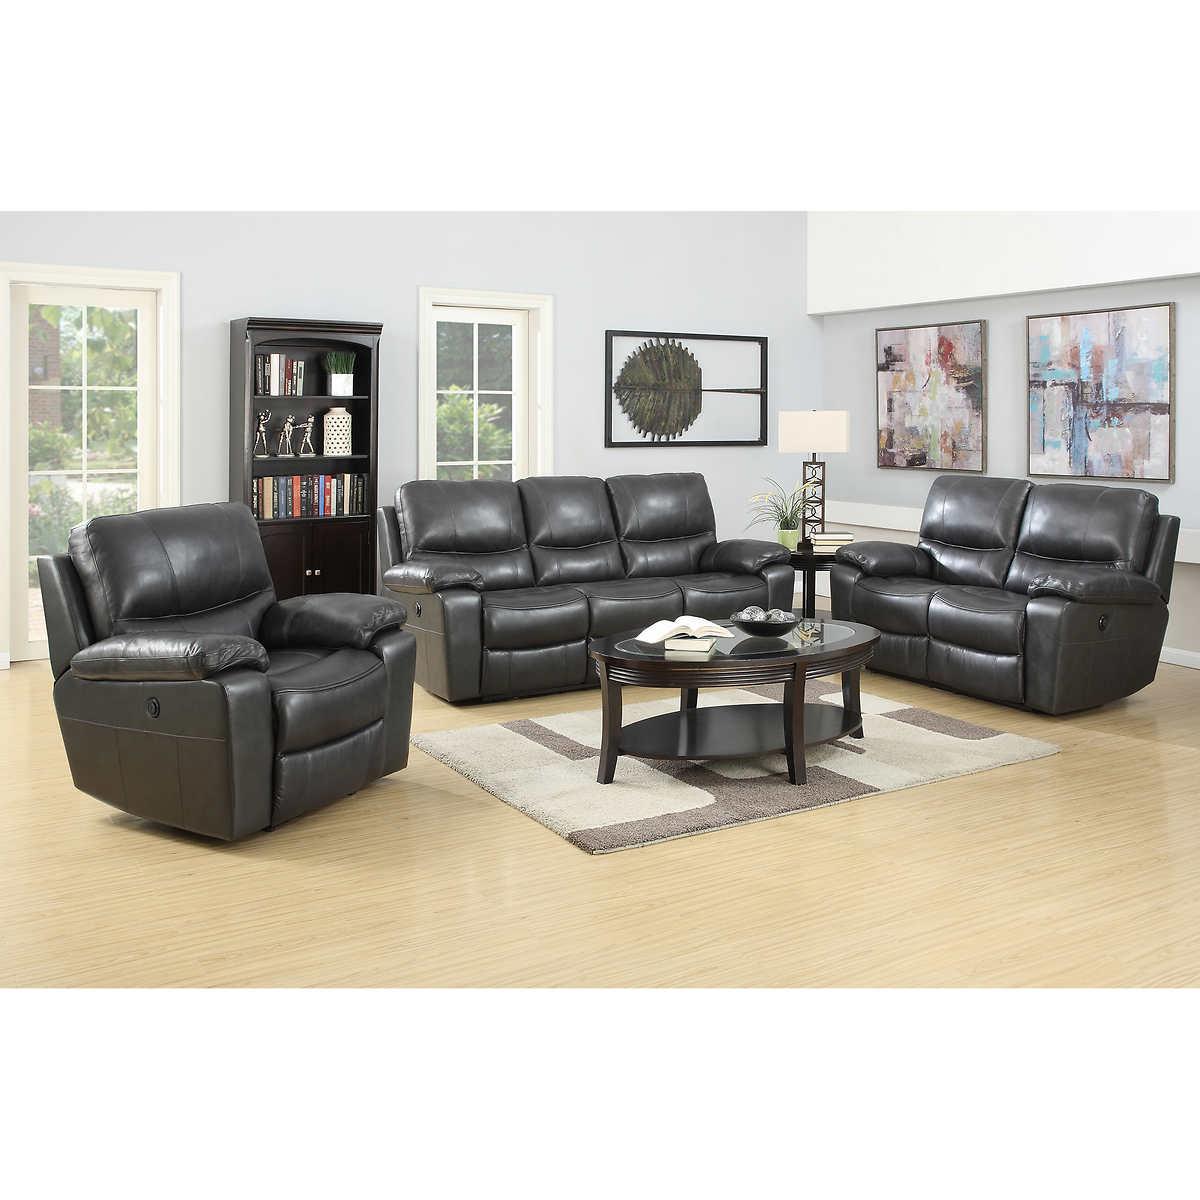 Costco Recliner Sofa Cheers Clayton Motion Leather Sofa